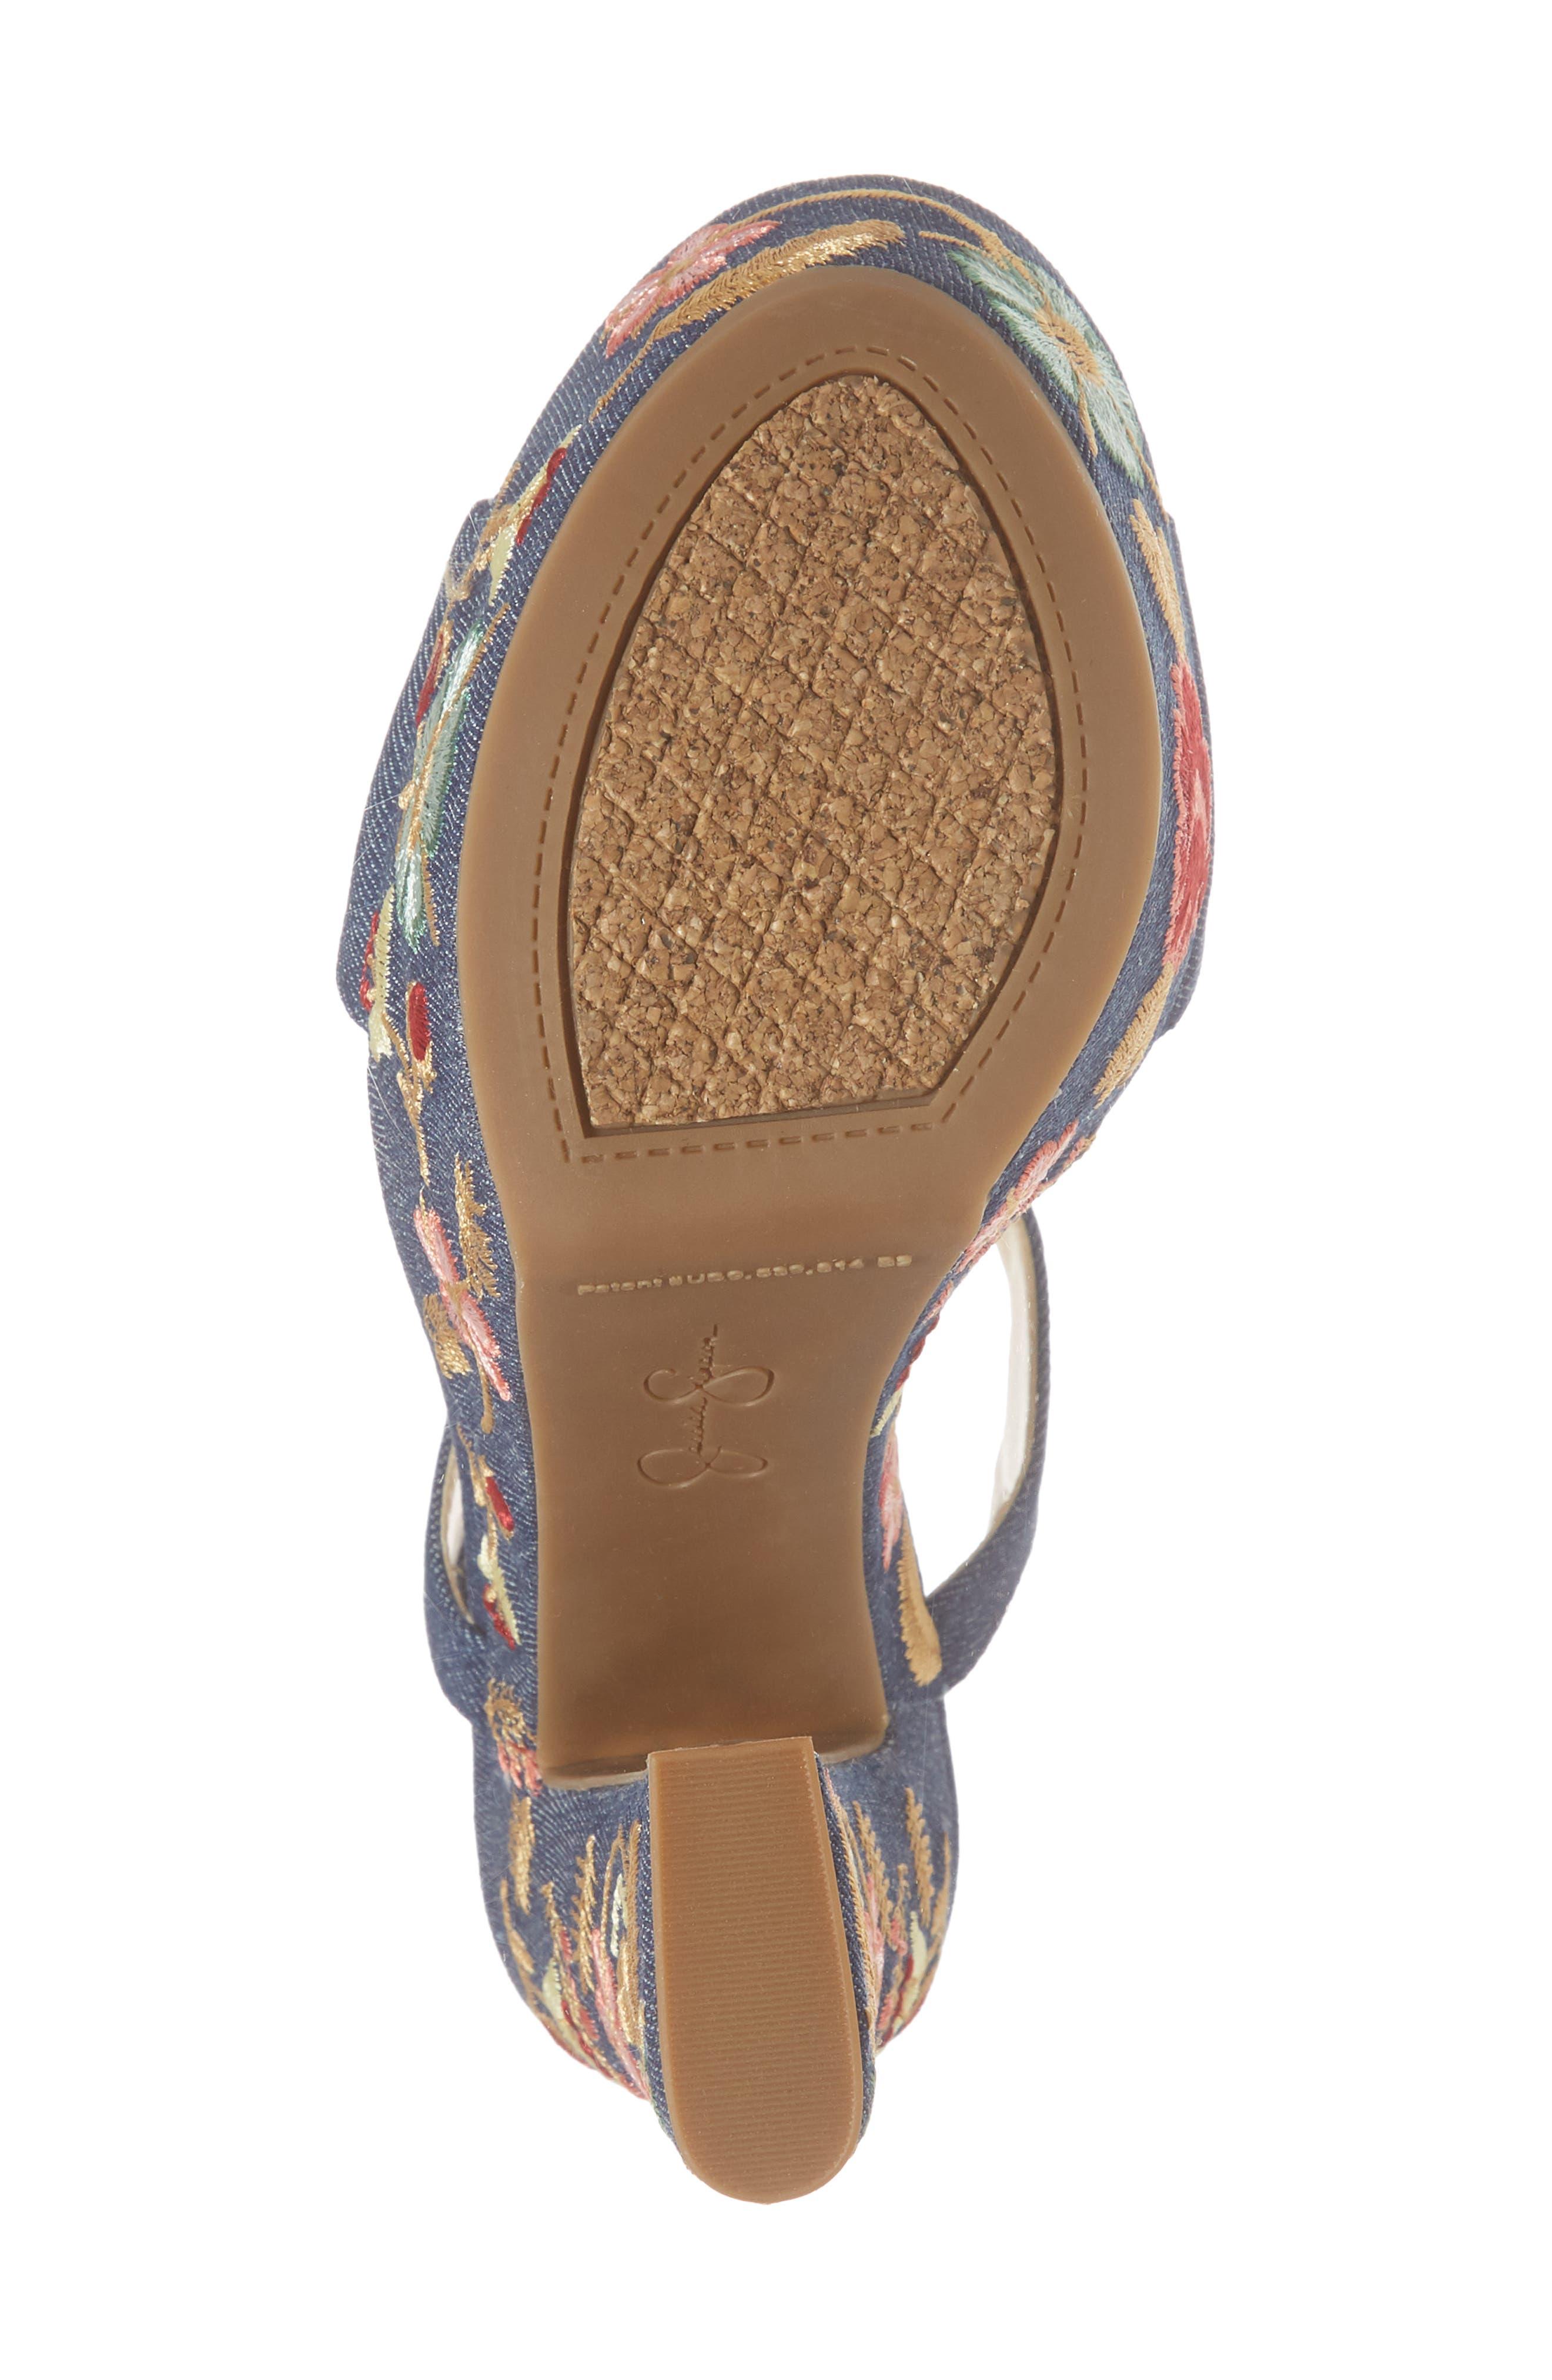 JESSICA SIMPSON,                             Divella Embroidered Platform Sandal,                             Alternate thumbnail 6, color,                             410